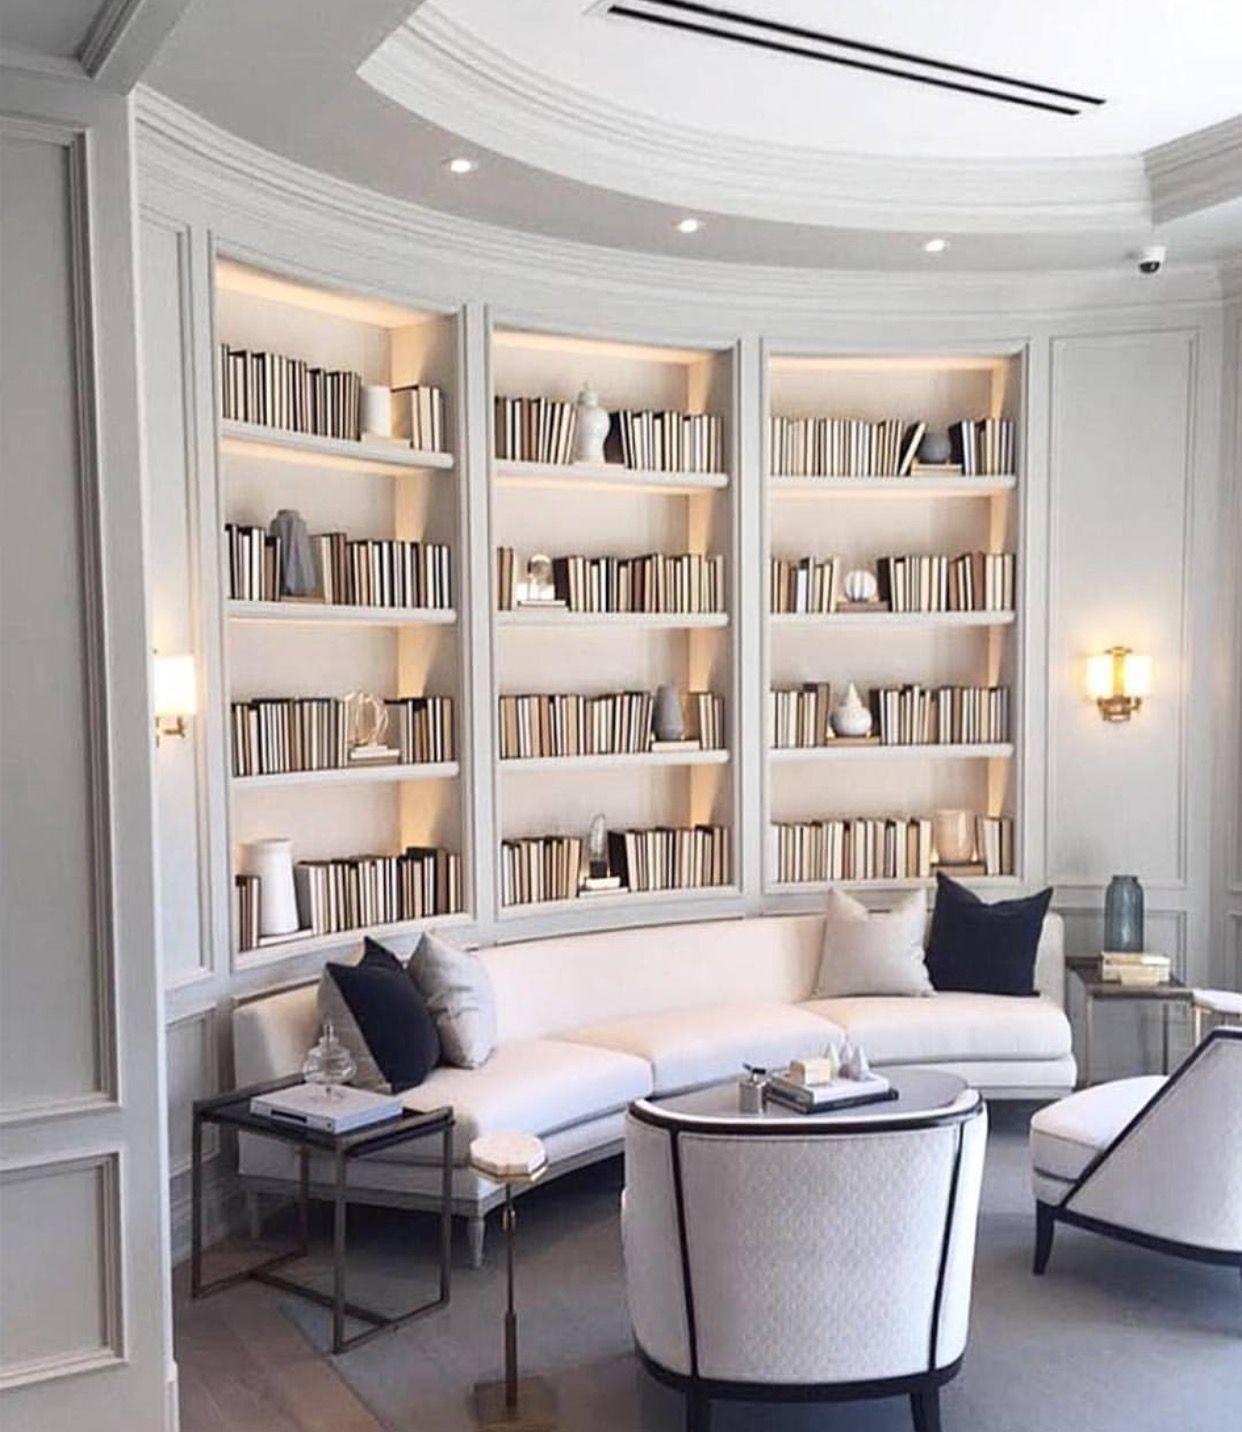 Affordable Casa Decor Home Design Concepts Ideas